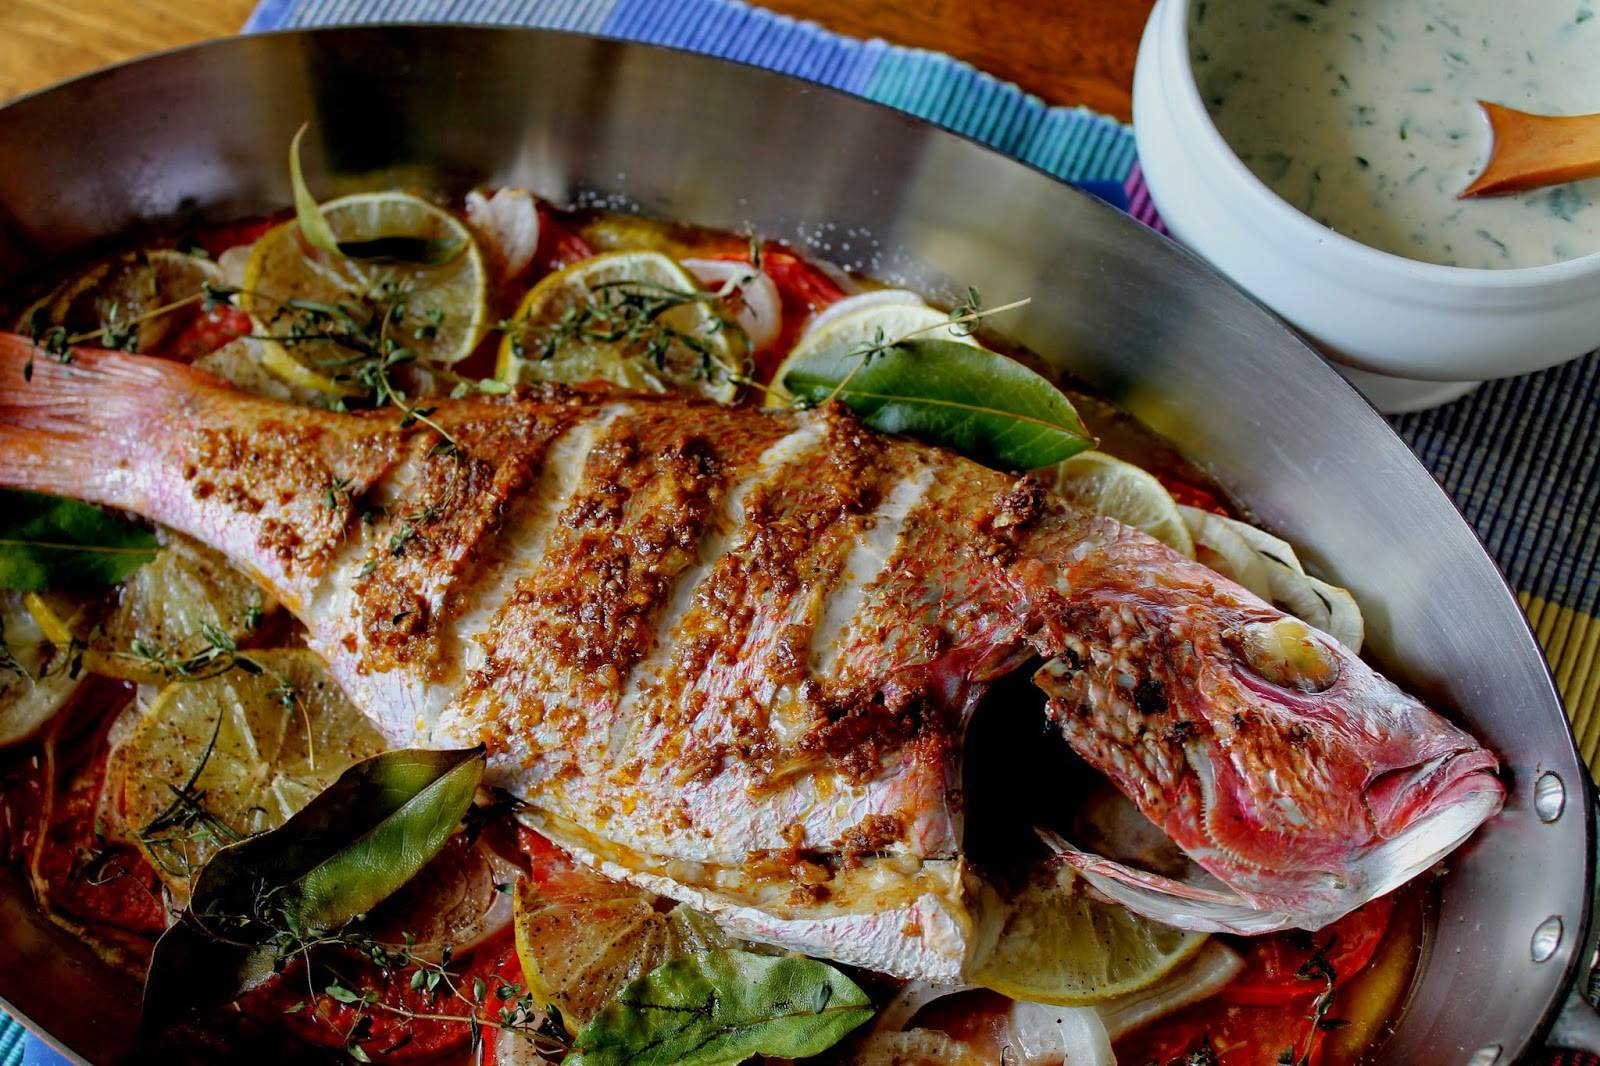 Pescado relleno al horno recetas judias for Como cocinar judias